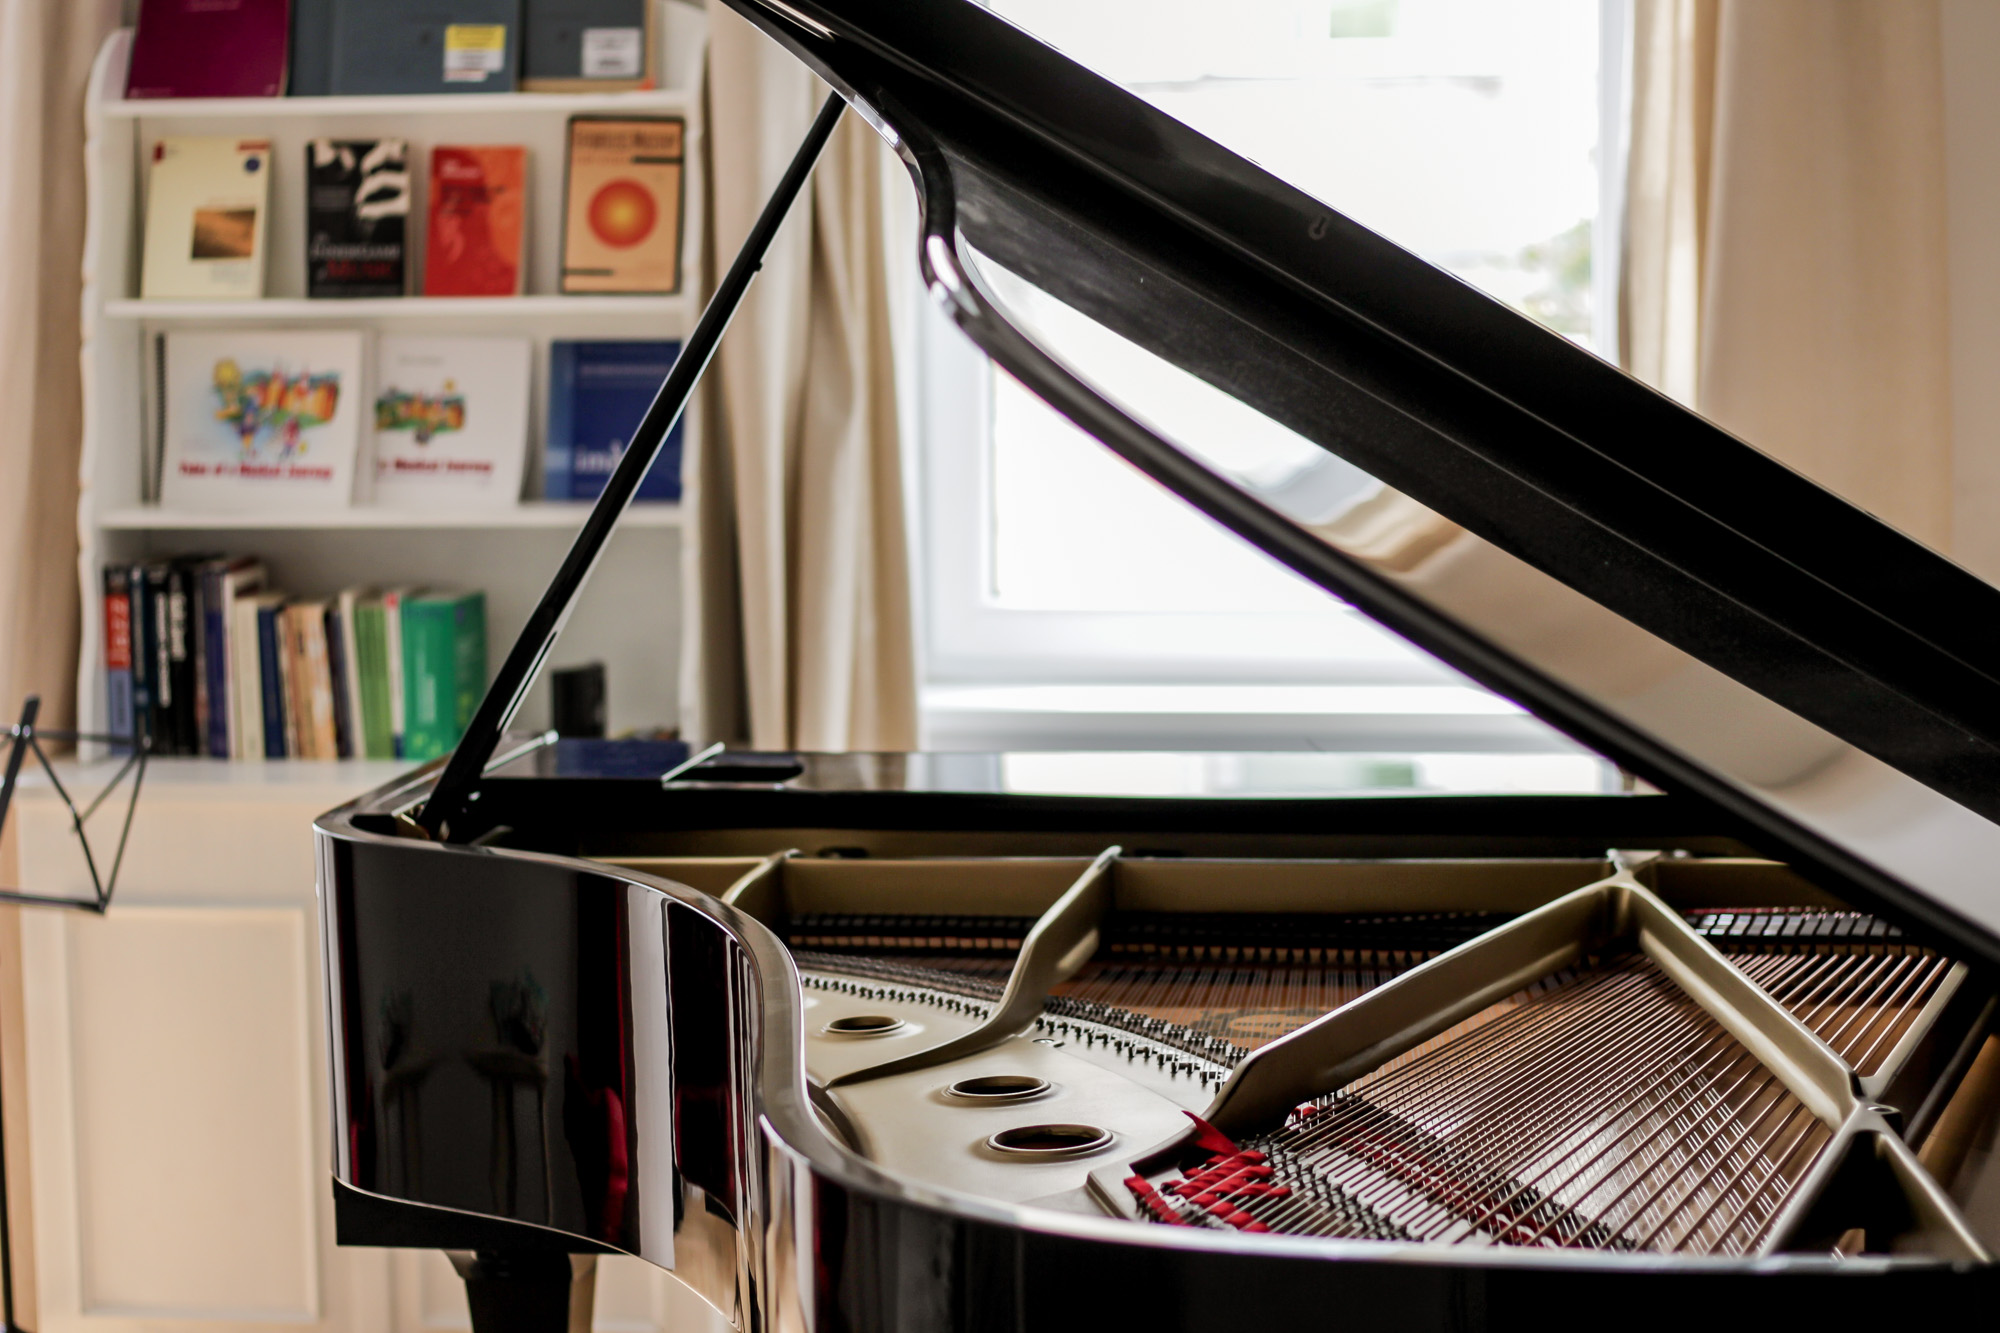 klavierunterricht wien bei stefan lechner piano lessons. Black Bedroom Furniture Sets. Home Design Ideas